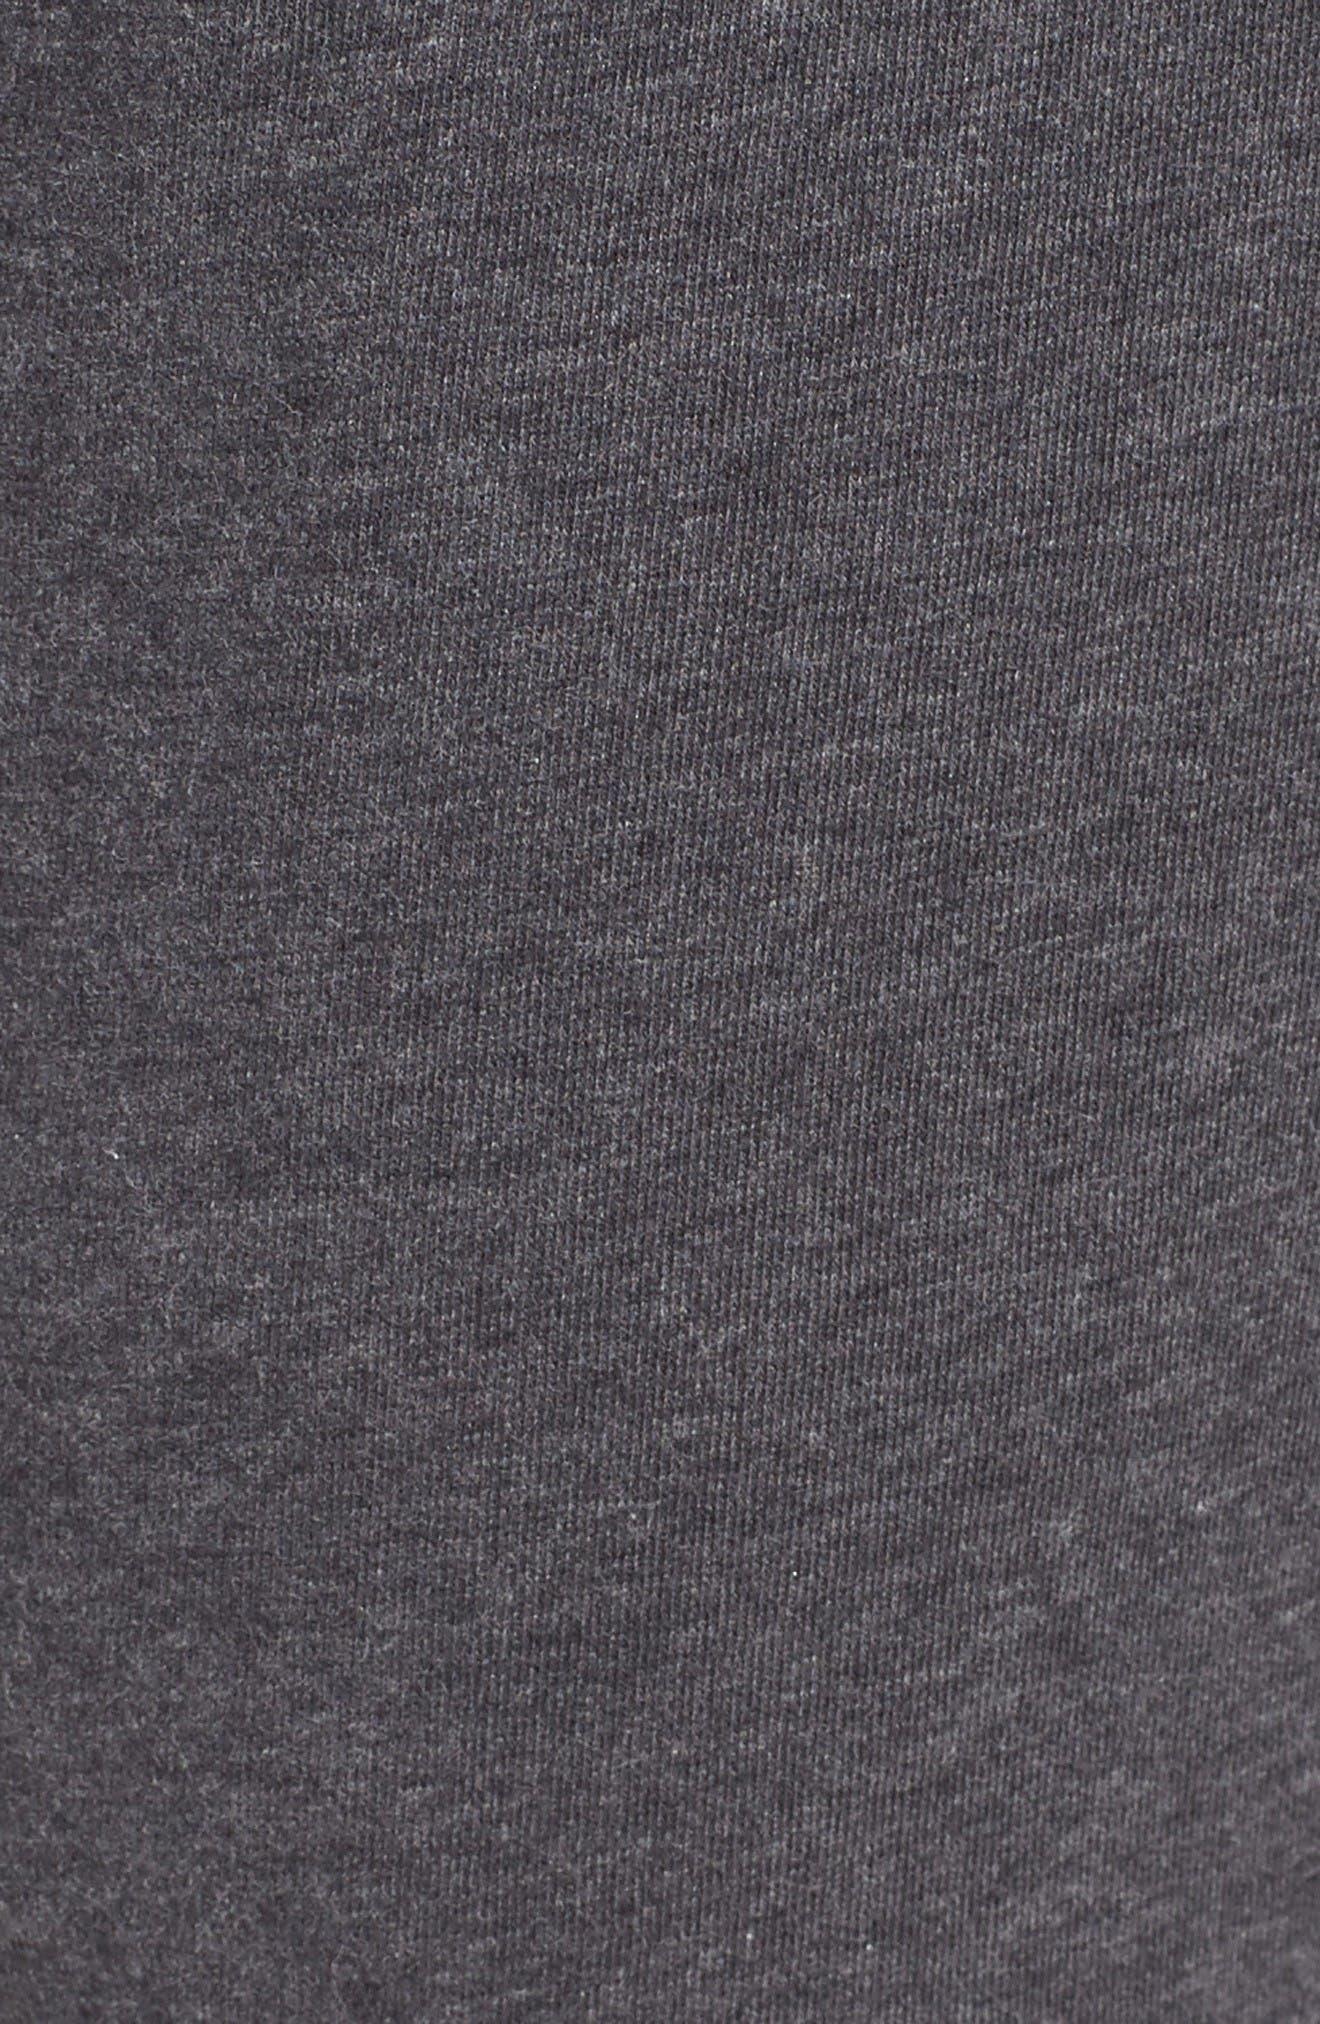 Stretch Cotton Lounge Pants,                             Alternate thumbnail 5, color,                             Grey Charcoal